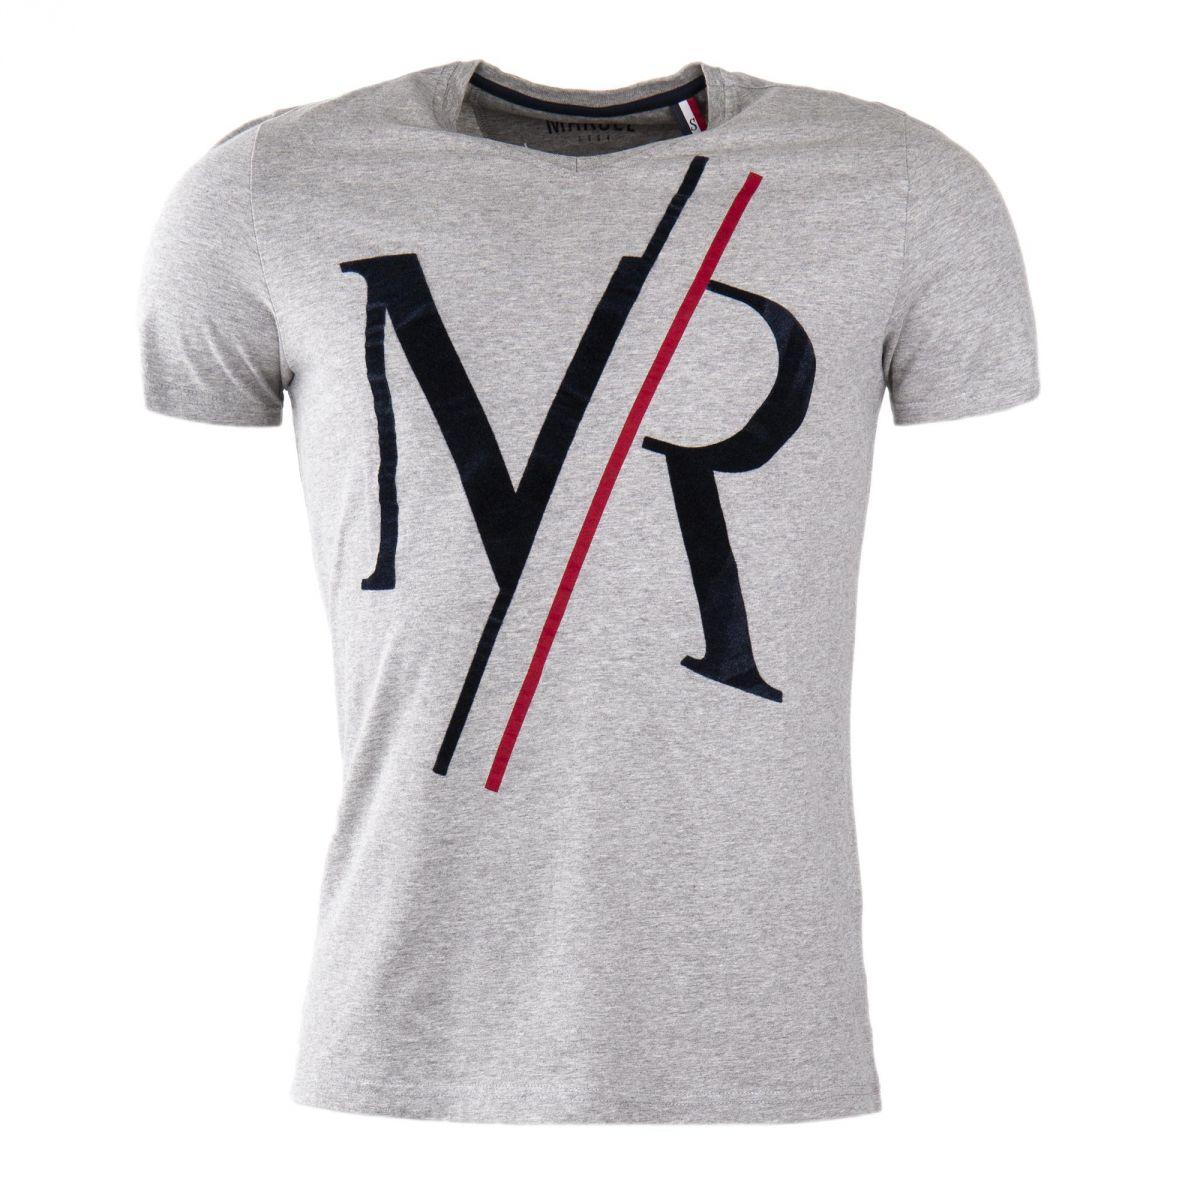 tee shirt manches courtes imprim homme little marcel prix d griff. Black Bedroom Furniture Sets. Home Design Ideas